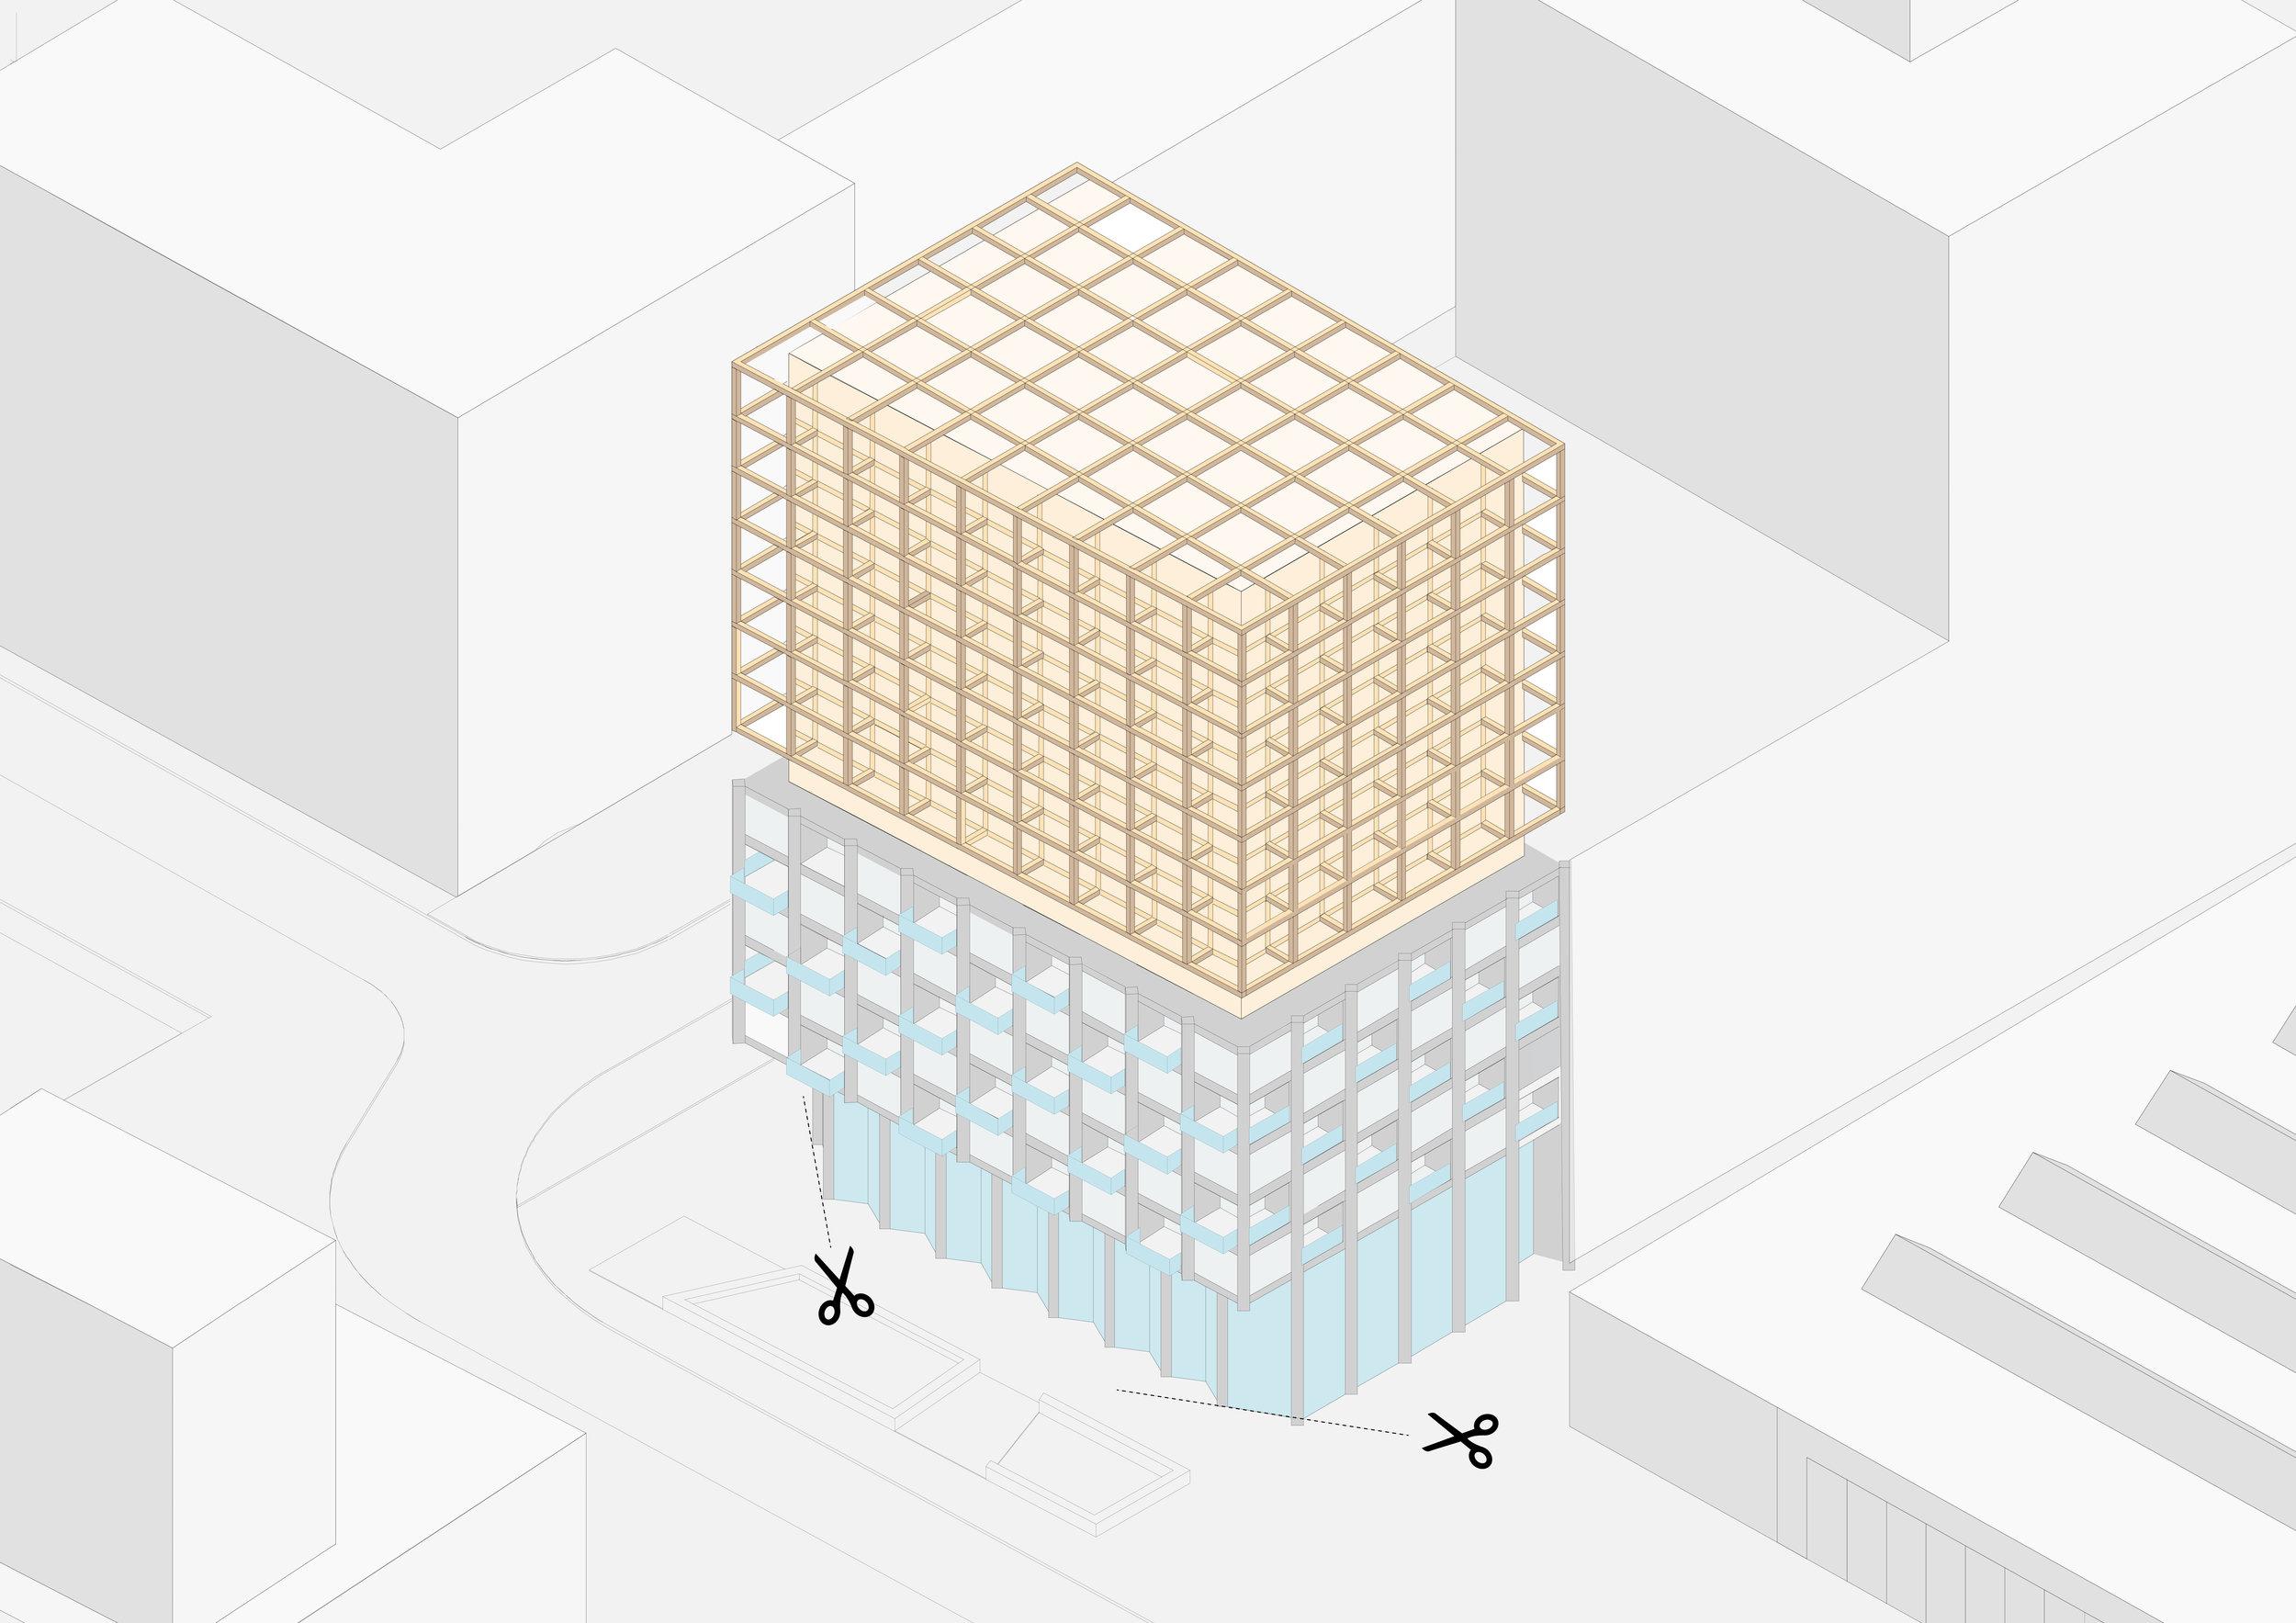 Elevation design: three layers